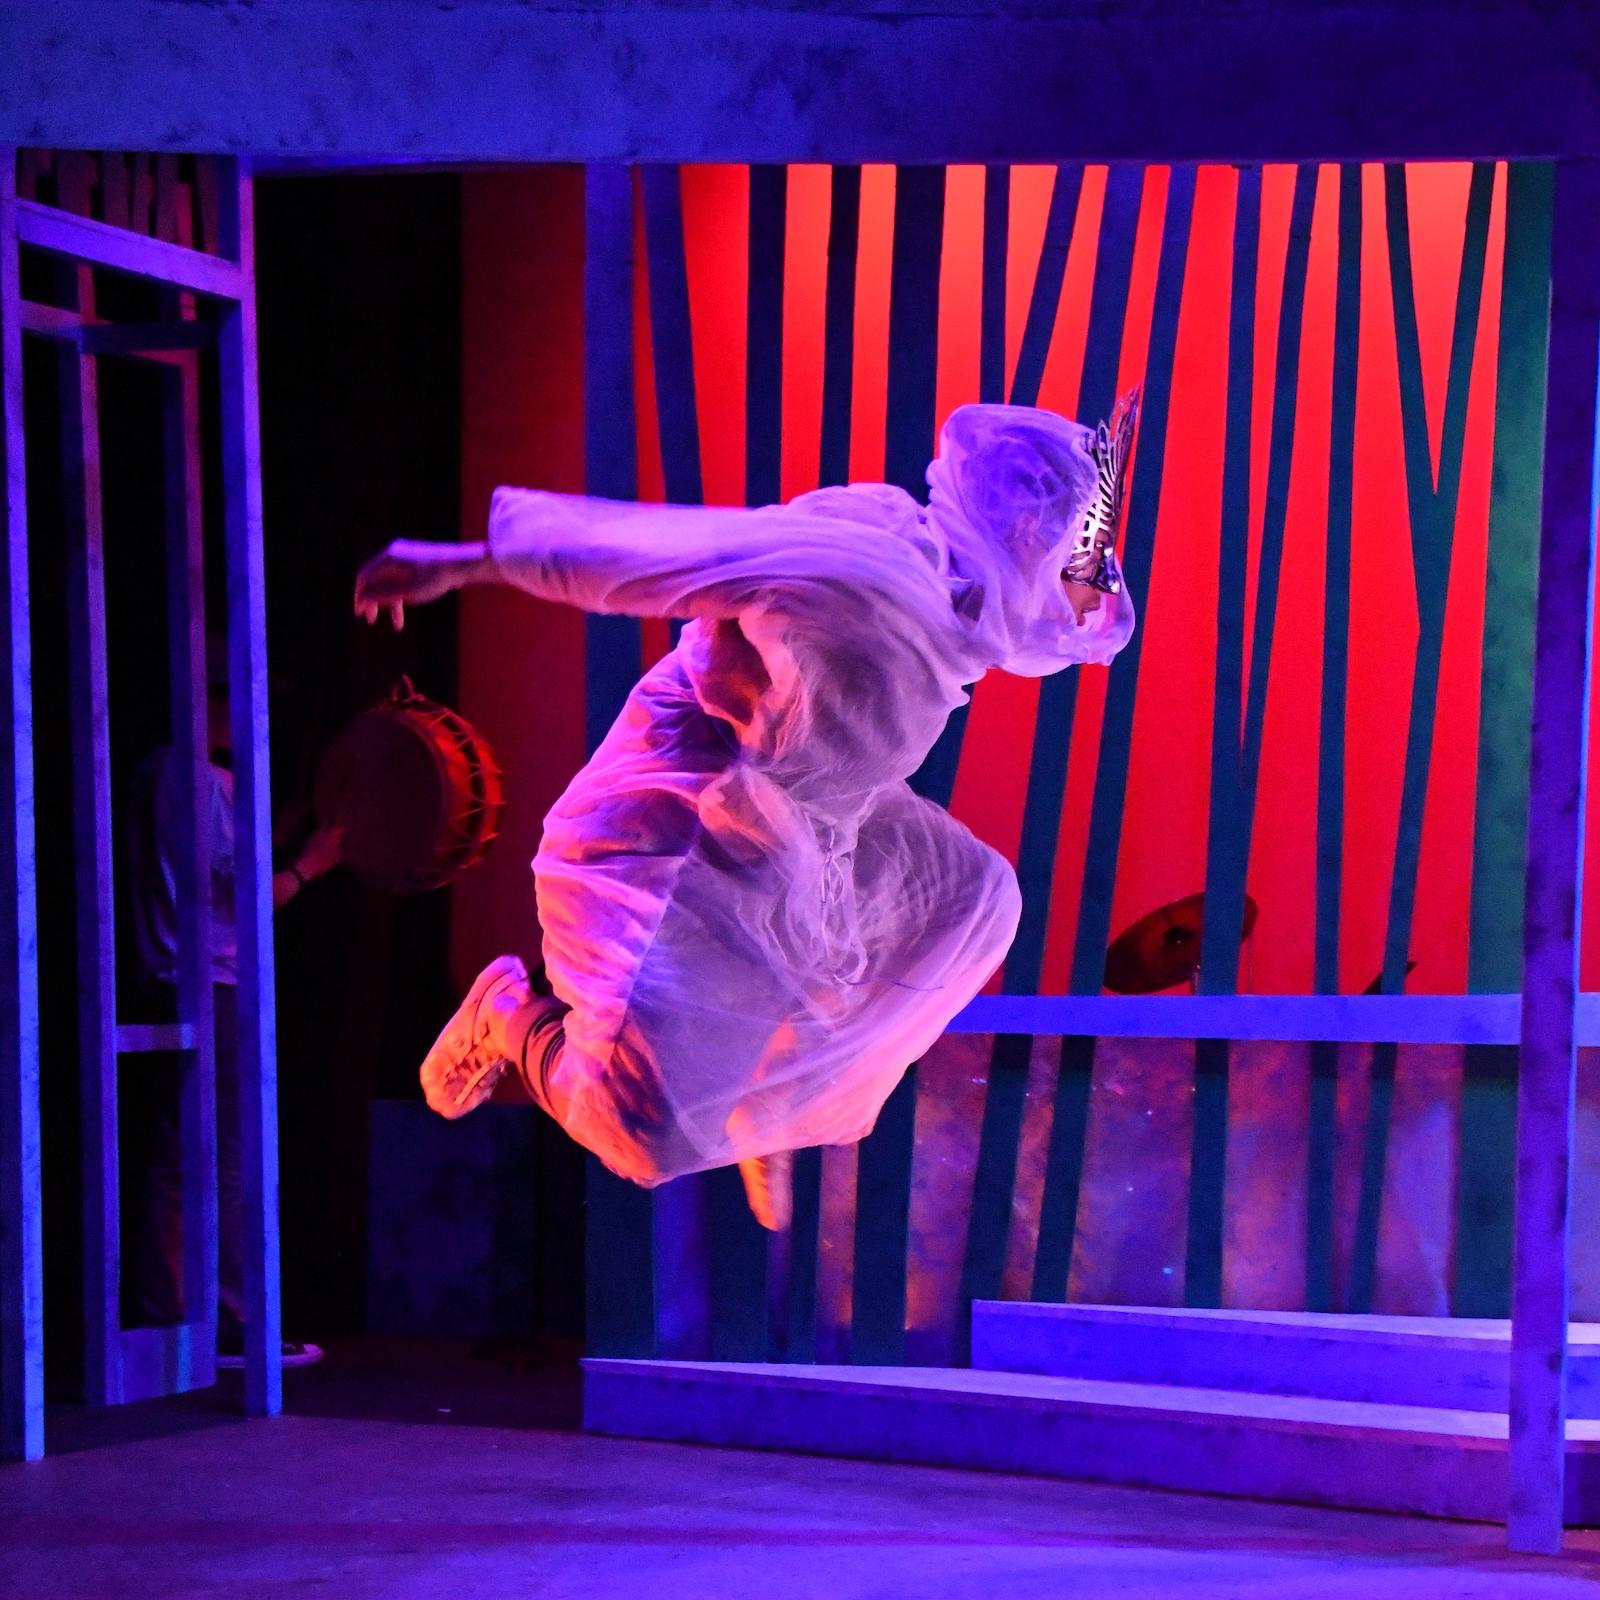 Minseob Yeom (Town Hall Theatre, 2017)  Photographer: Jay Yamada